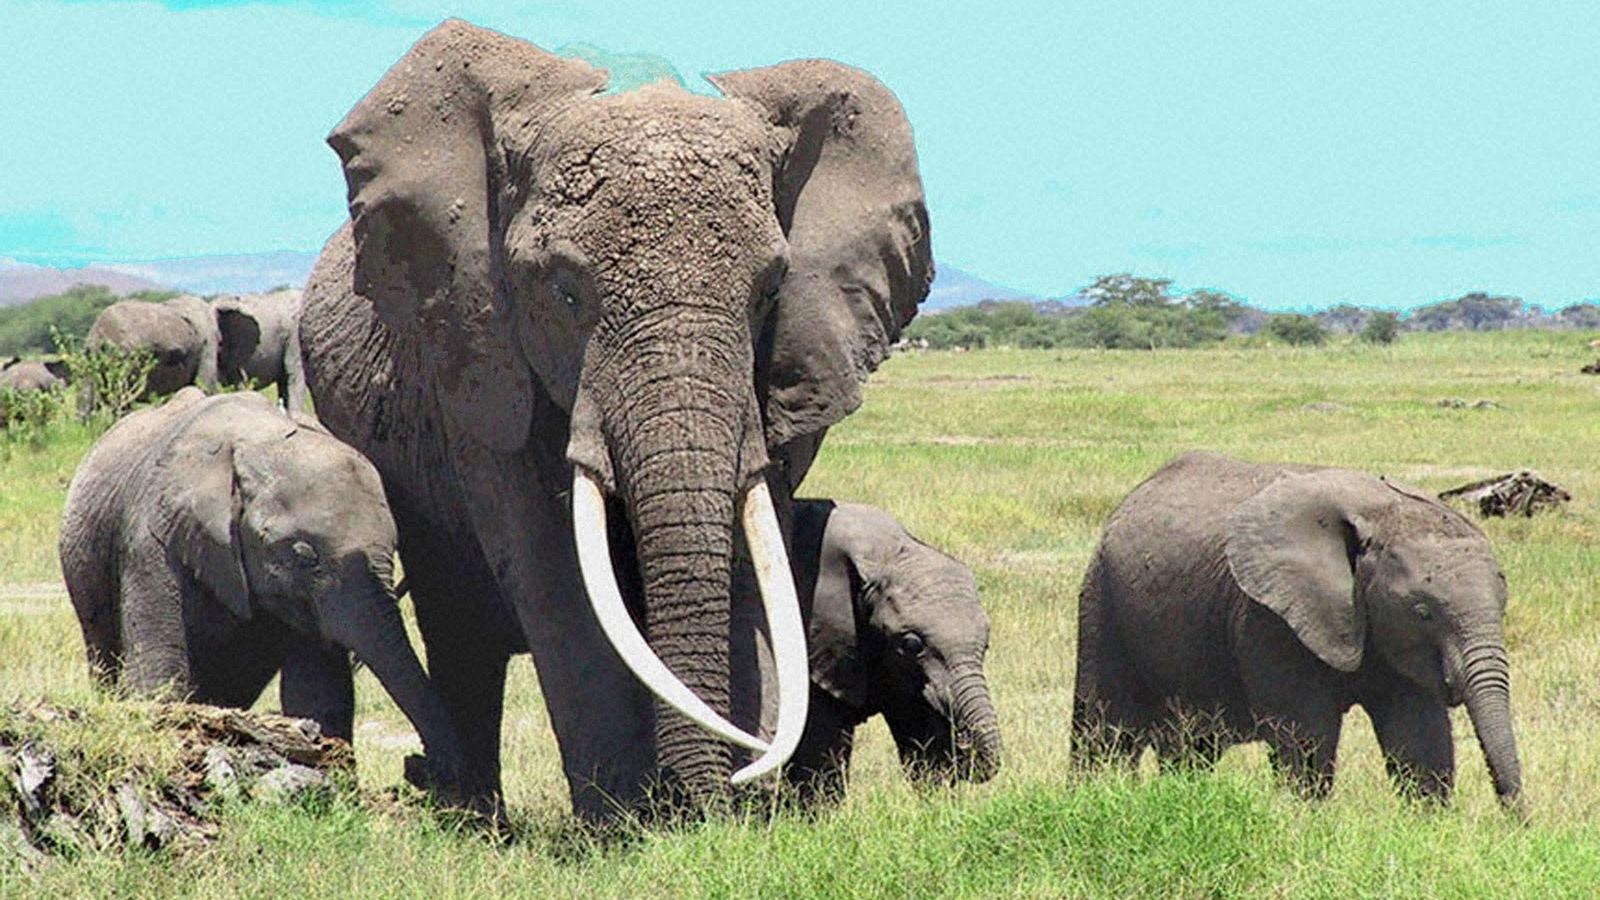 Baby elephant desktop wallpaper wallpapersafari - Baby elephant wallpaper ...